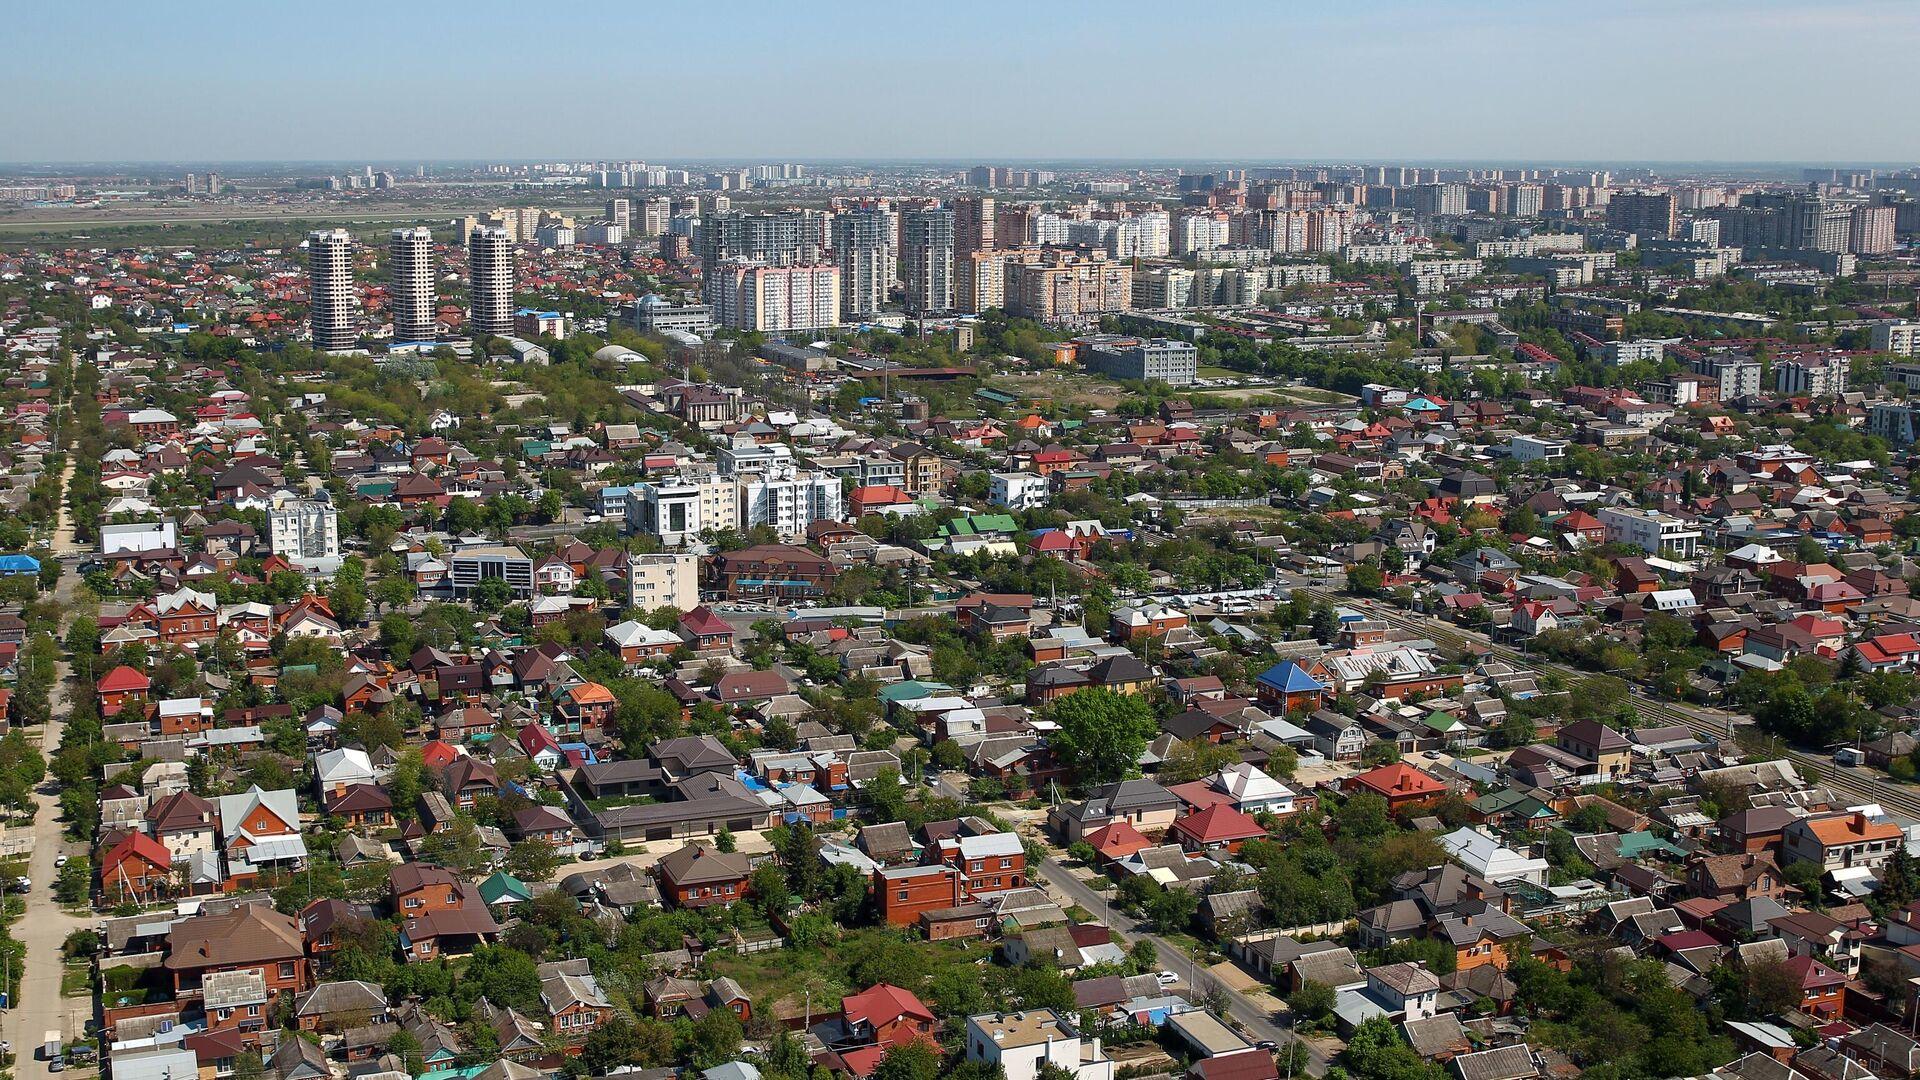 Город Краснодар - РИА Новости, 1920, 23.09.2020